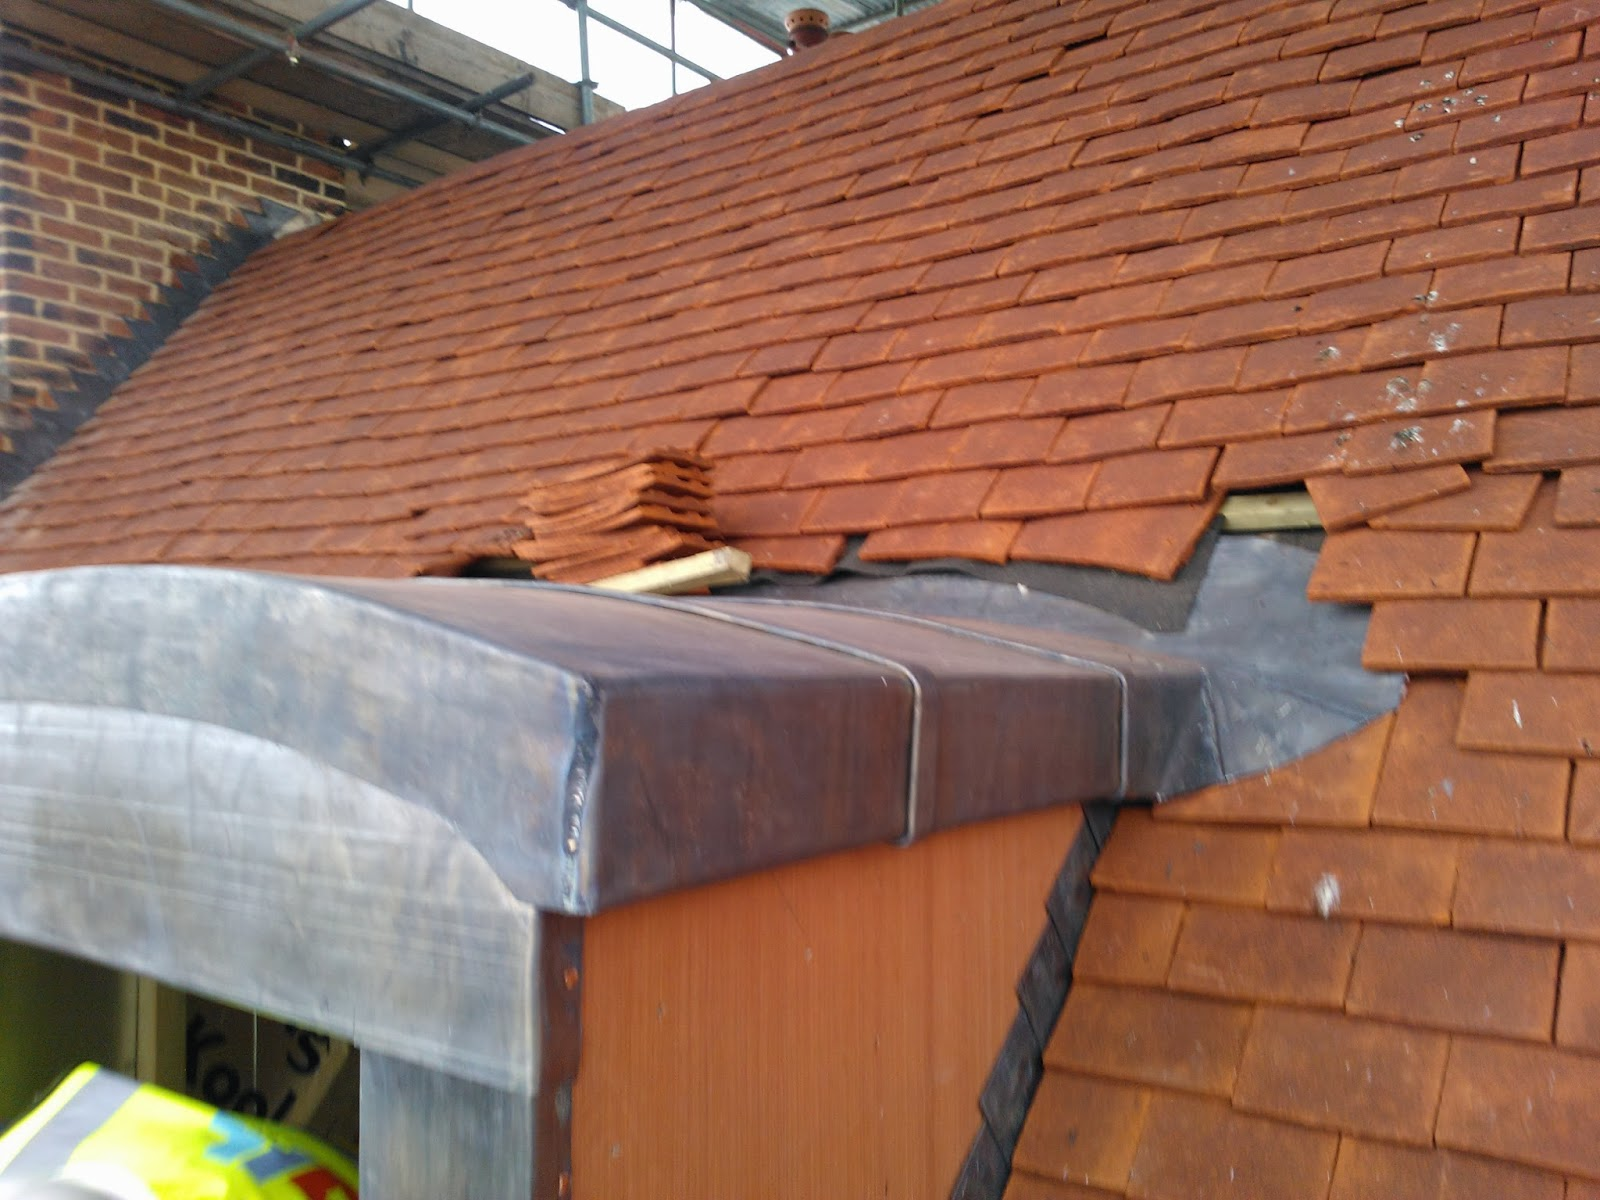 Brentwood School School House Refurbishment Site Visit